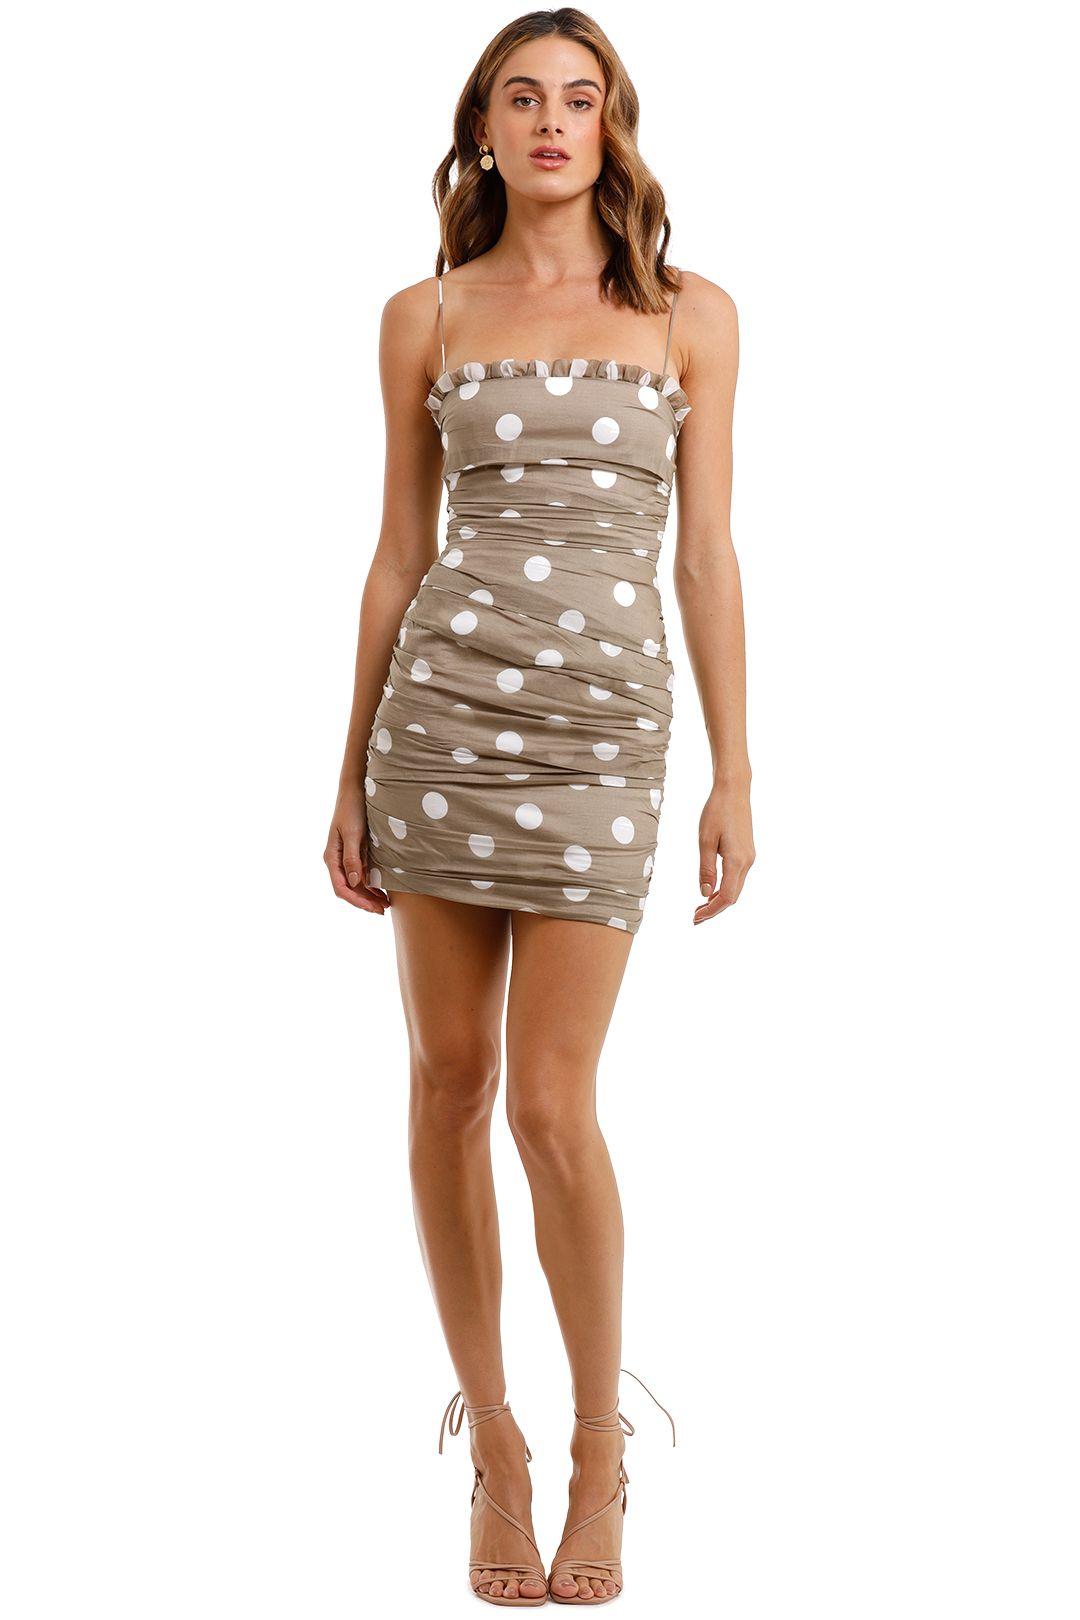 Bec and Bridge Hazel Mini Dress